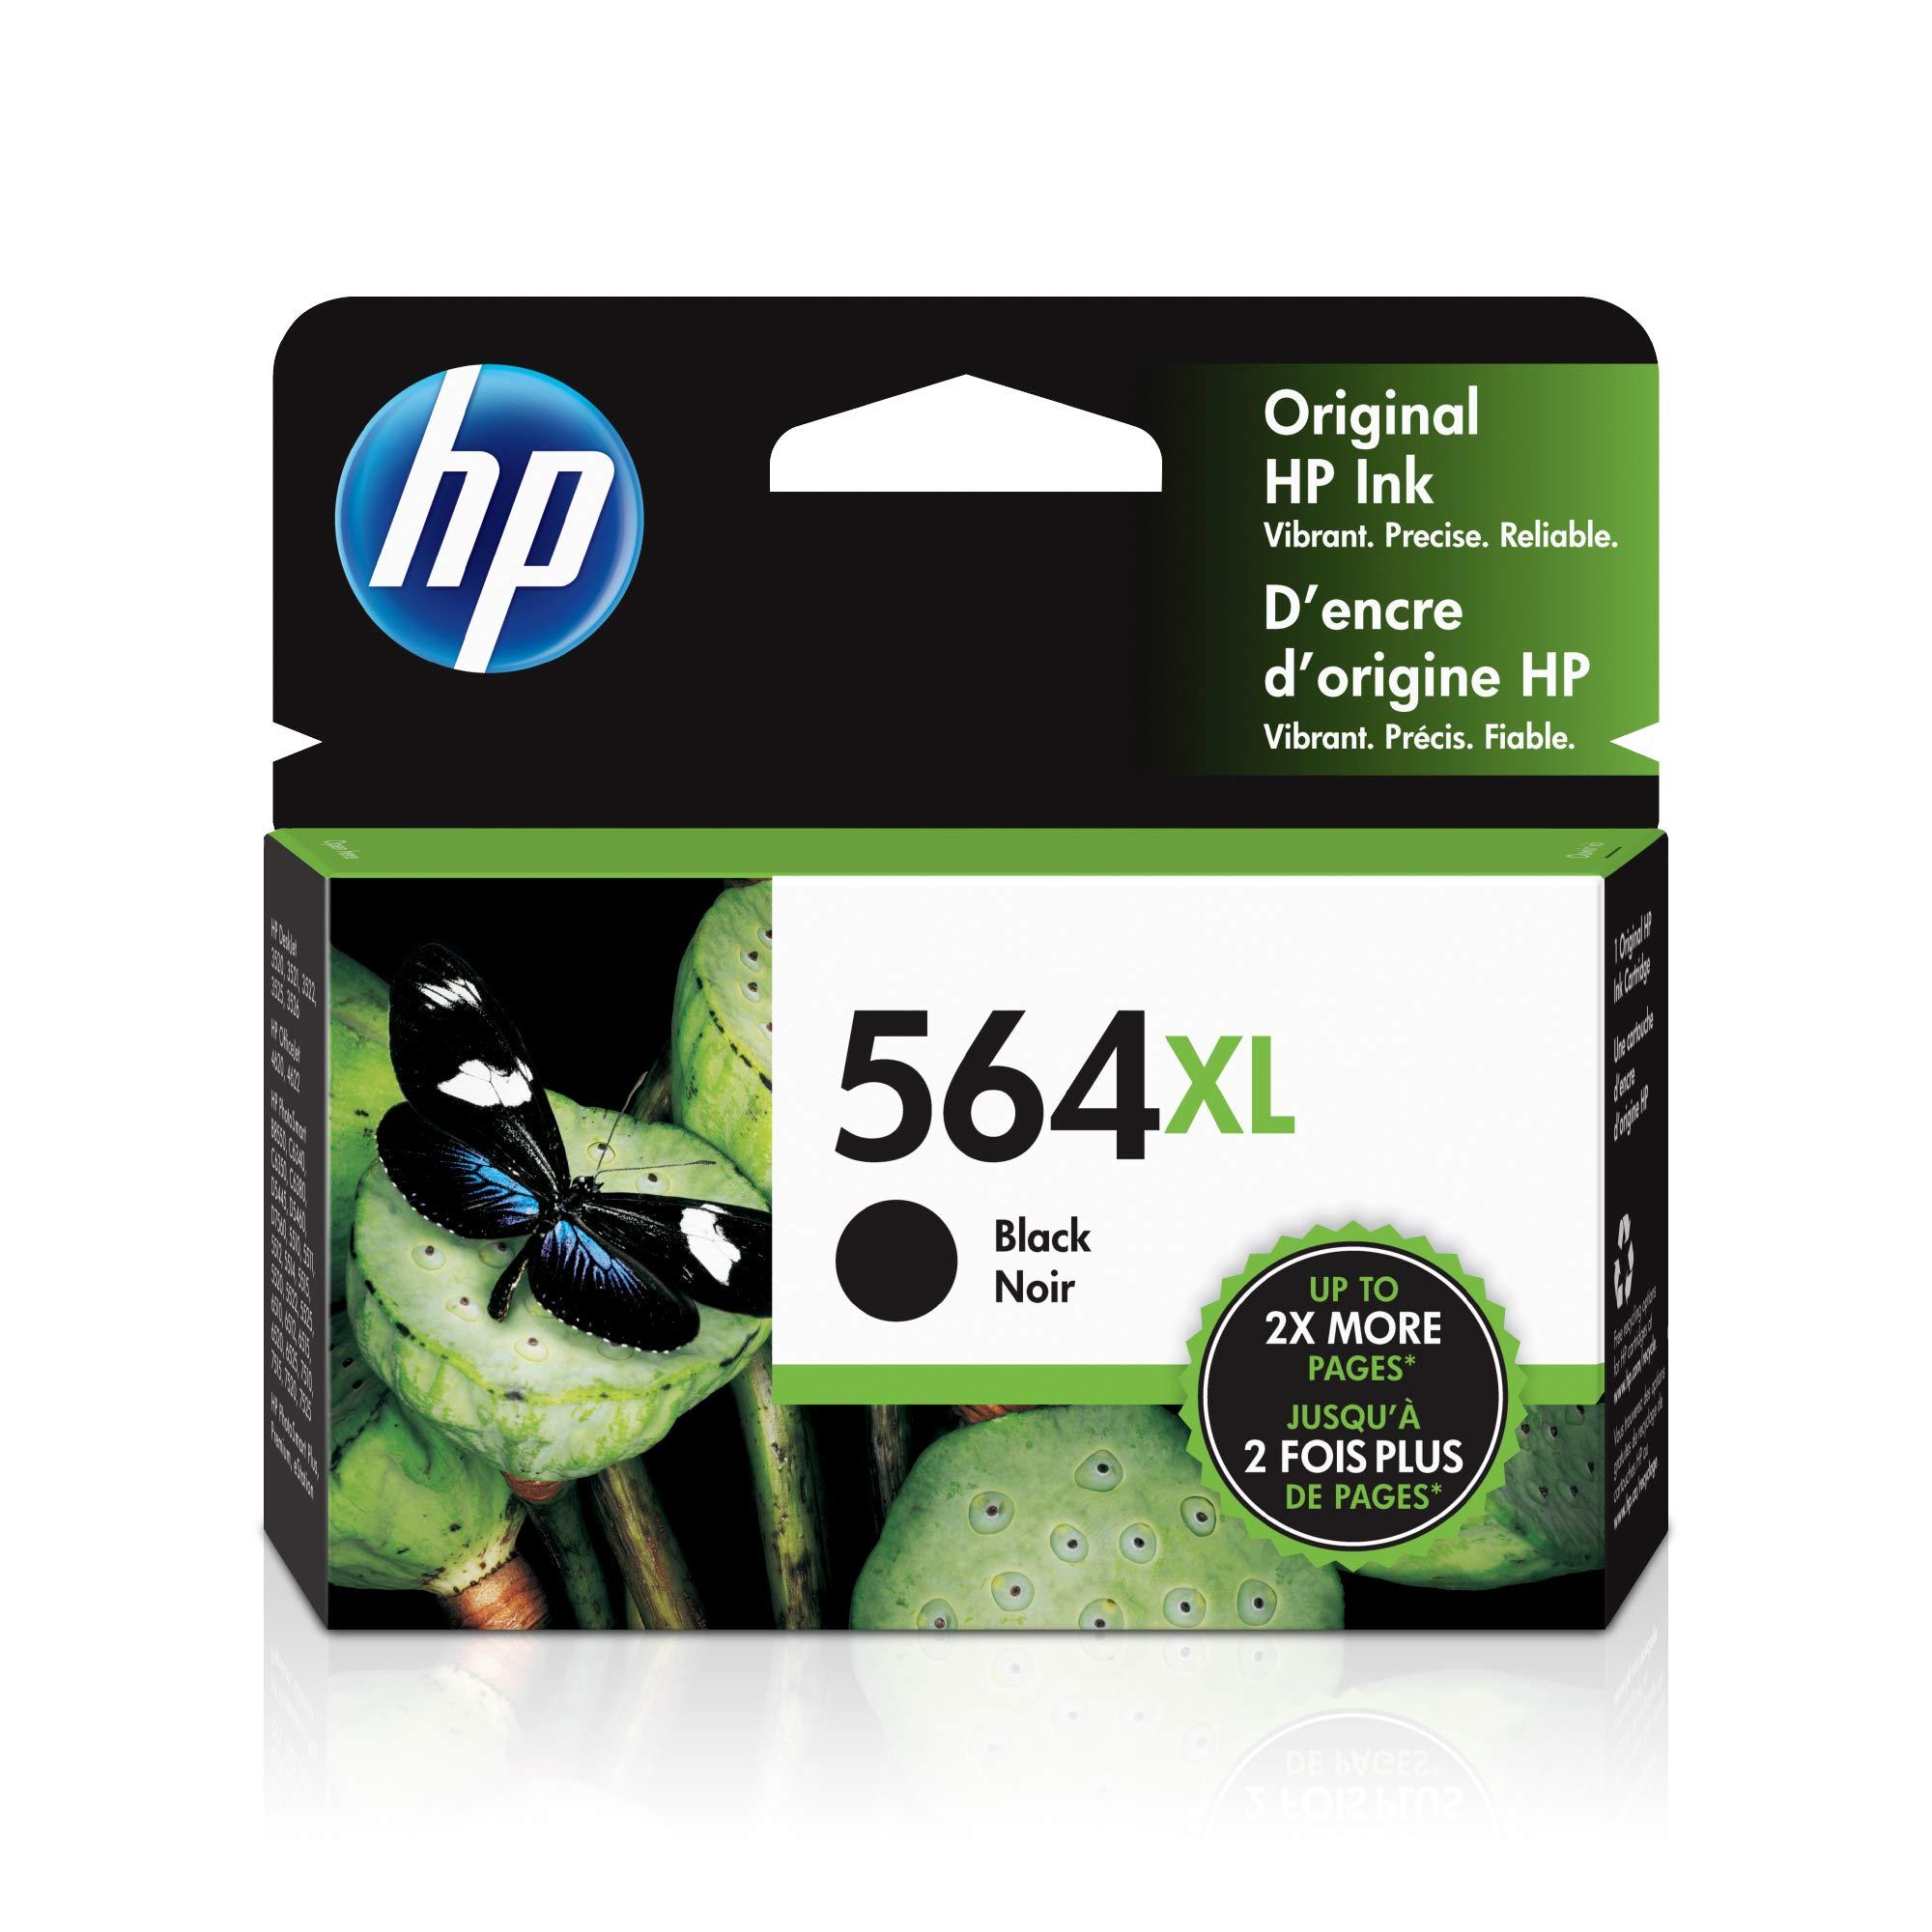 HP 564XL | Ink Cartridge | Works with HP Deskjet 3500 Series, HP Officejet 4600 5500 C6300 6500 7500 Series, B8550, D7560, C510, B209, B210, C309, C310, C410, C510 | Black | CN684WN